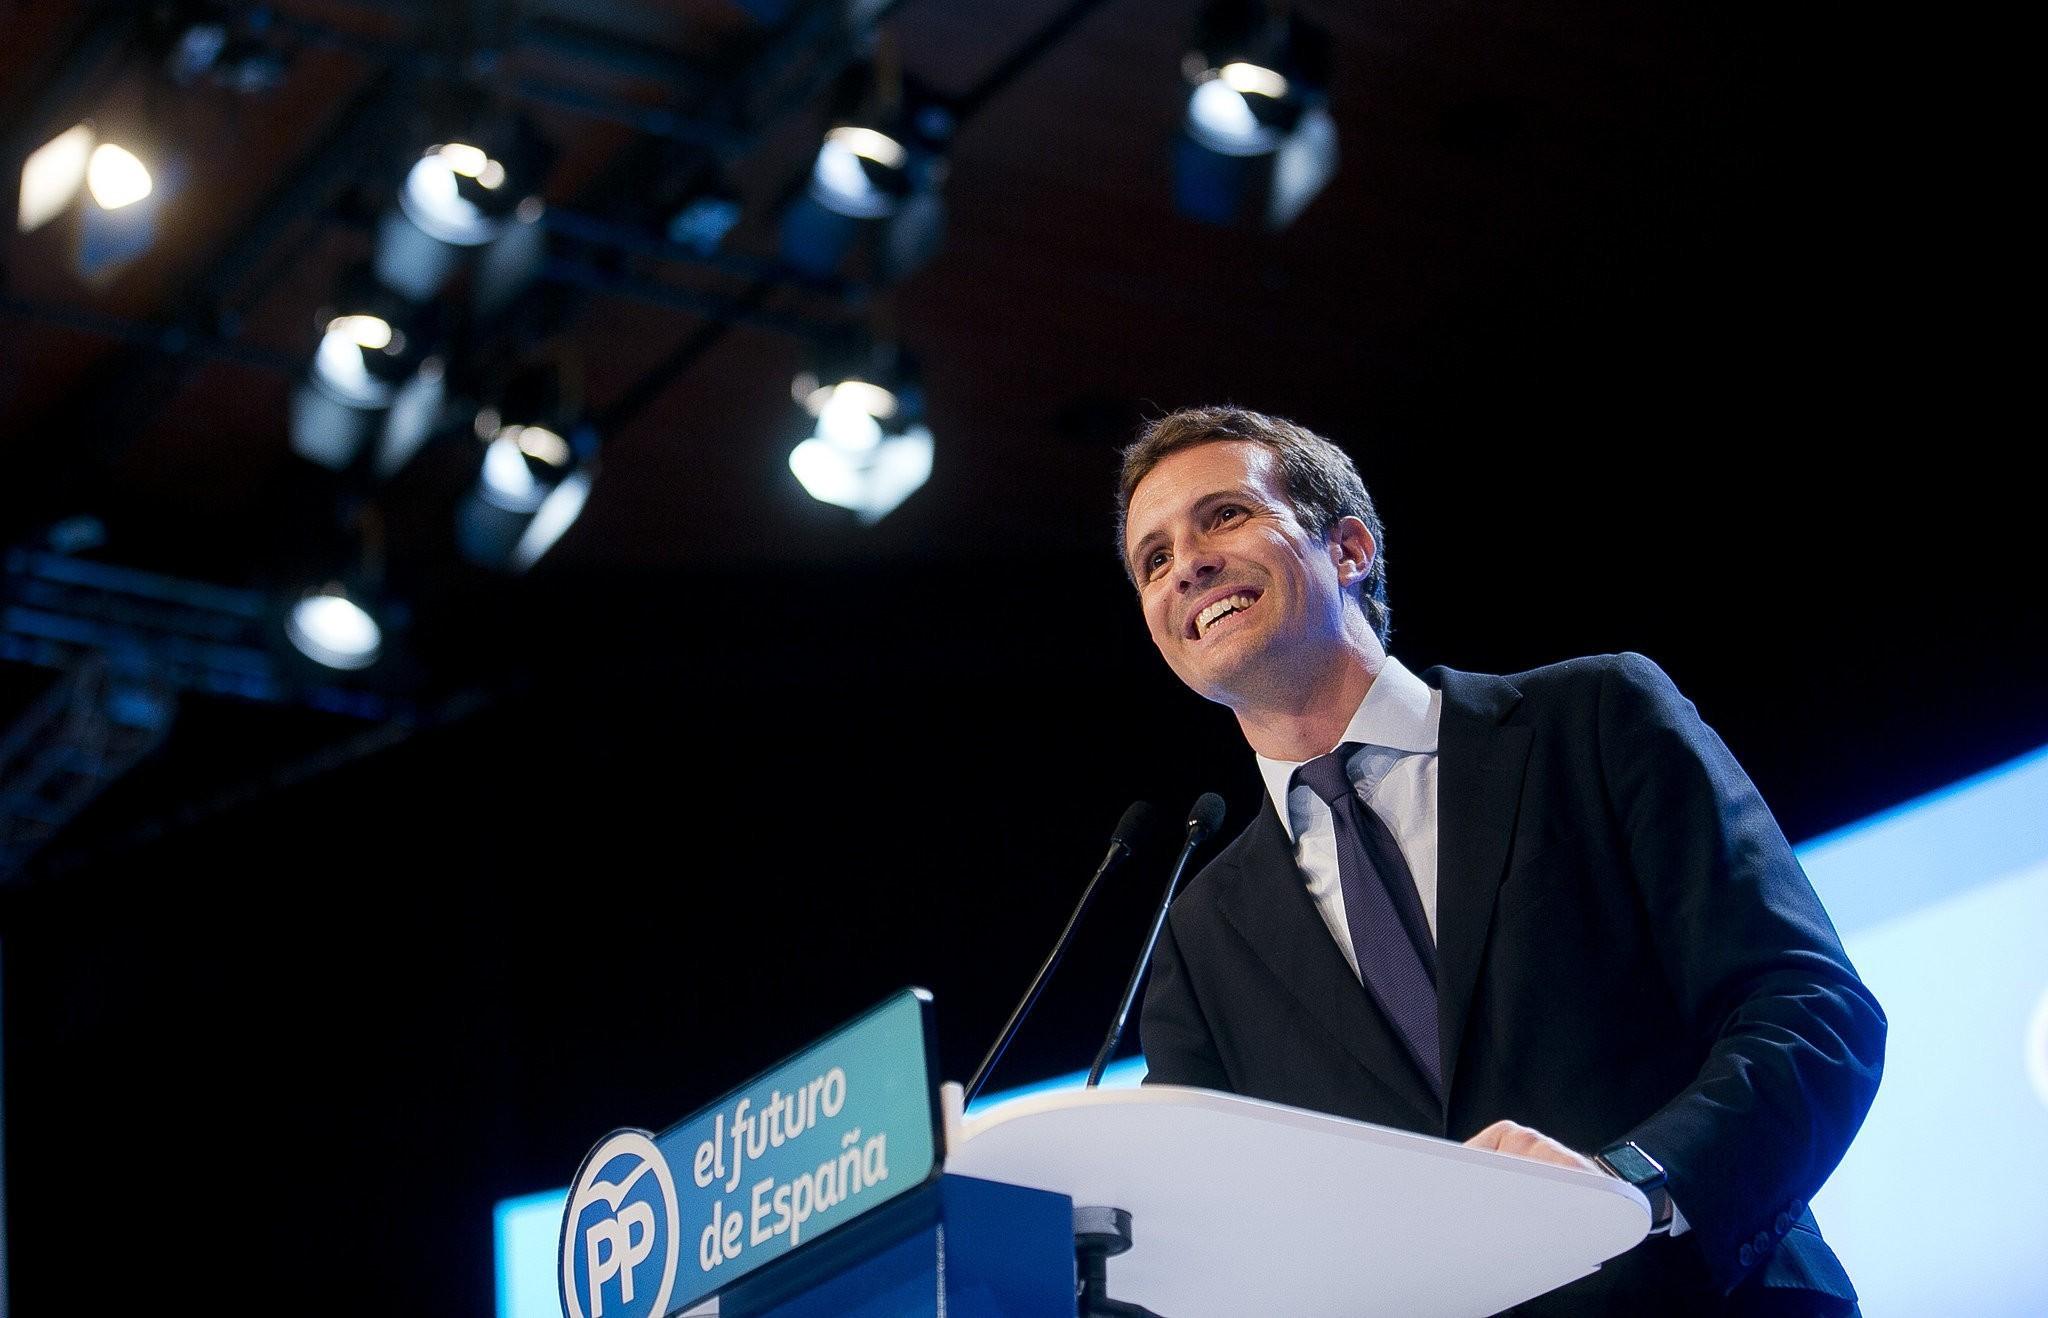 pablo casado recela reférendum sánchez cataluña quedan